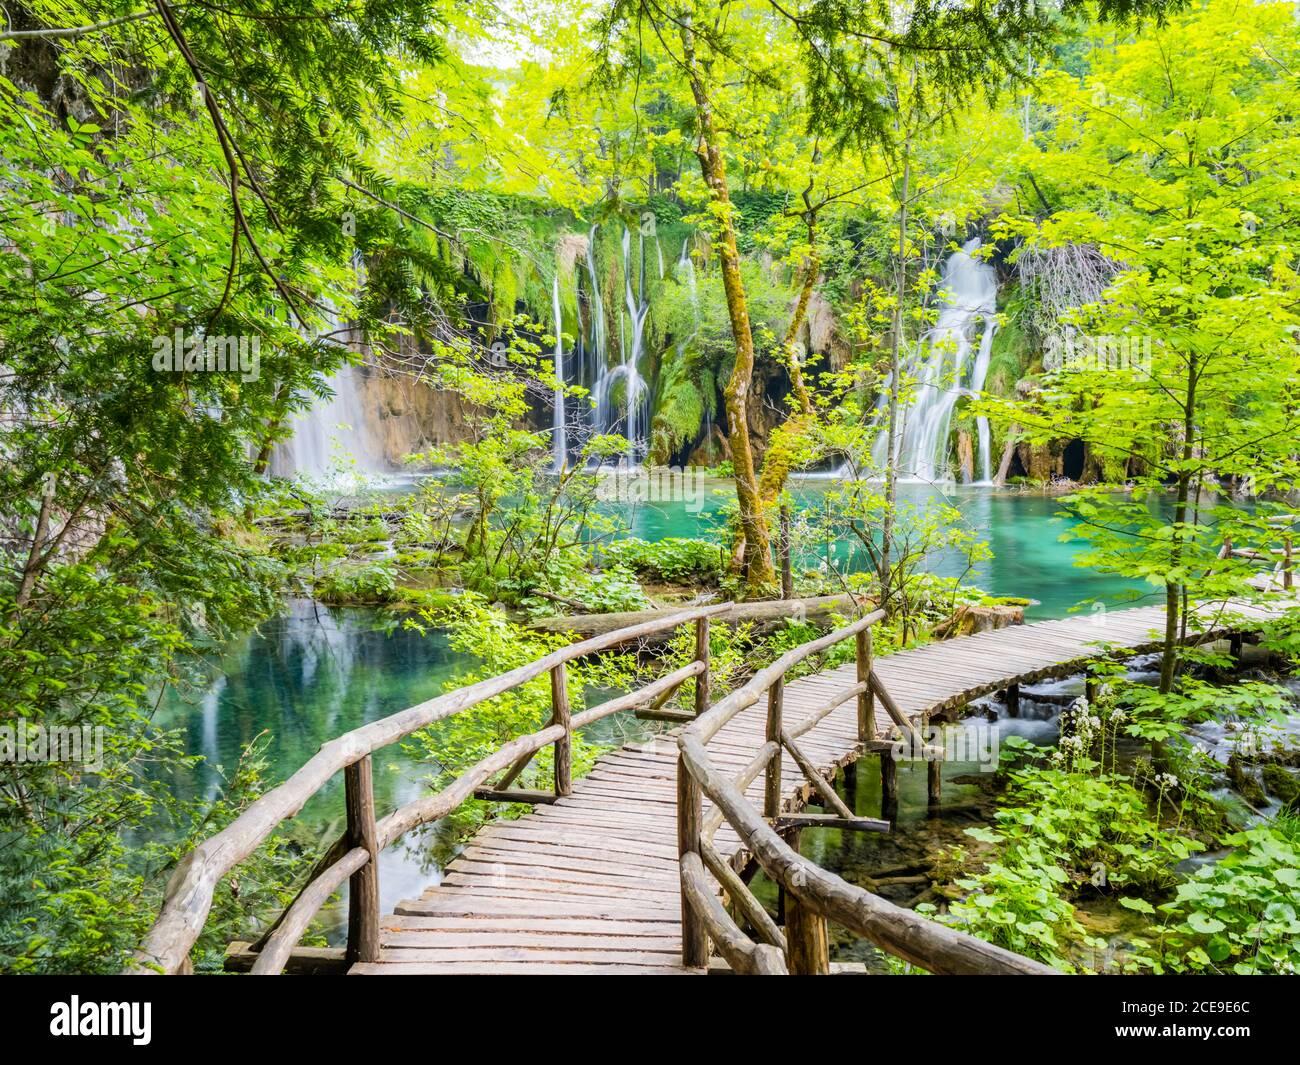 Fantastic views view amazing like dreamland fairytale land National park Plitvice lakes in Croatia Europe water flowing waterflow waterfall Stock Photo